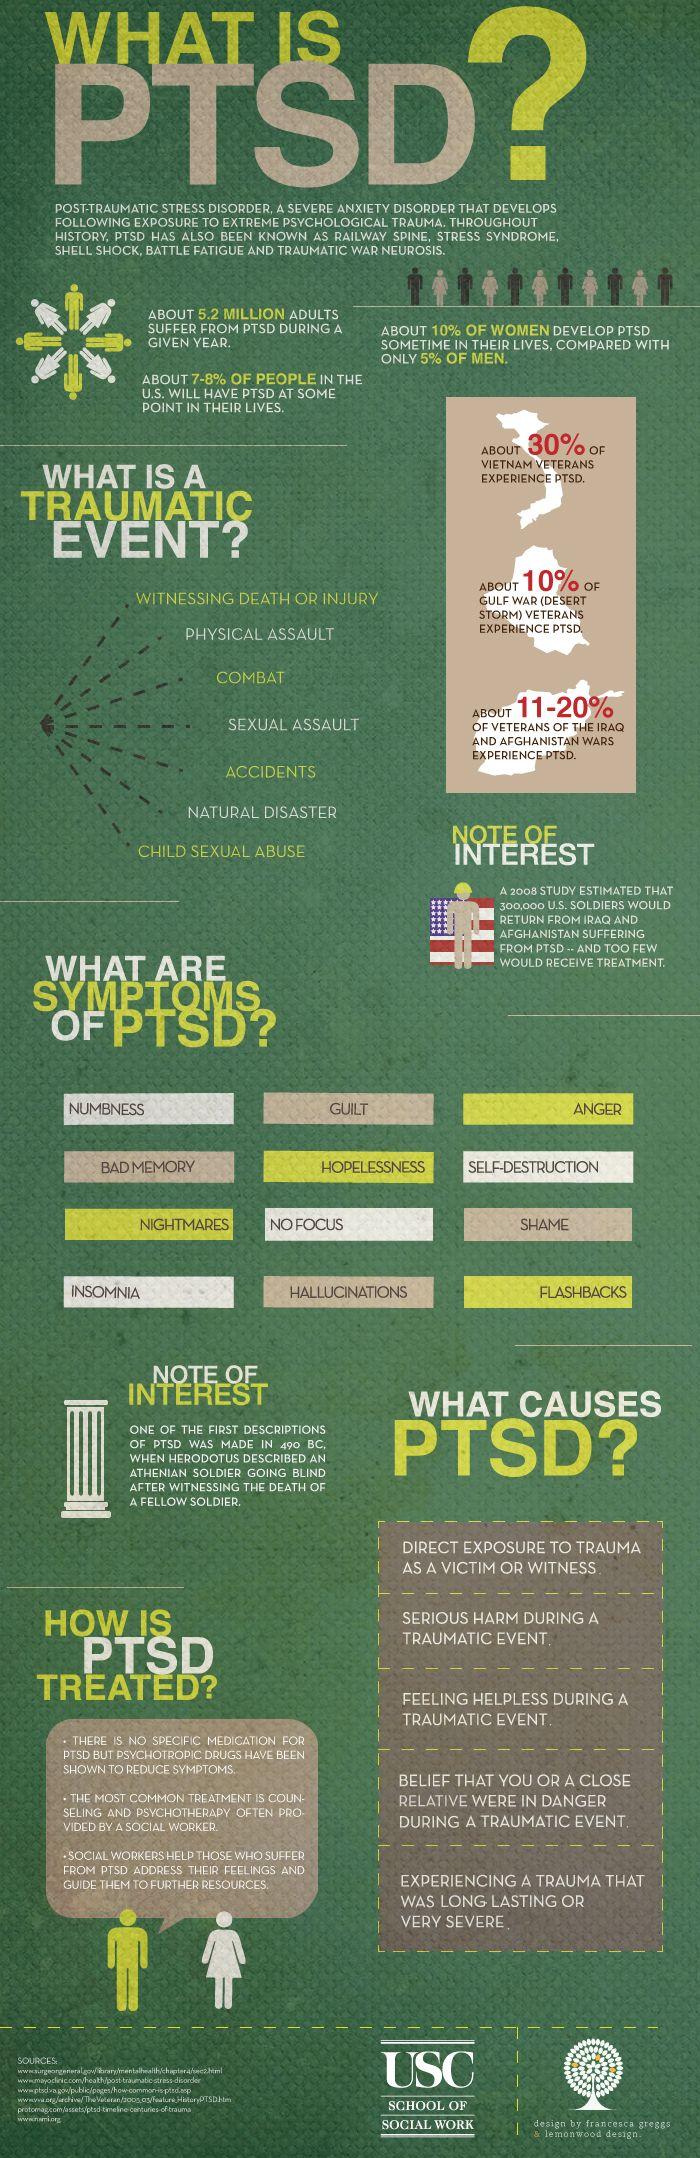 PTSD infographic.